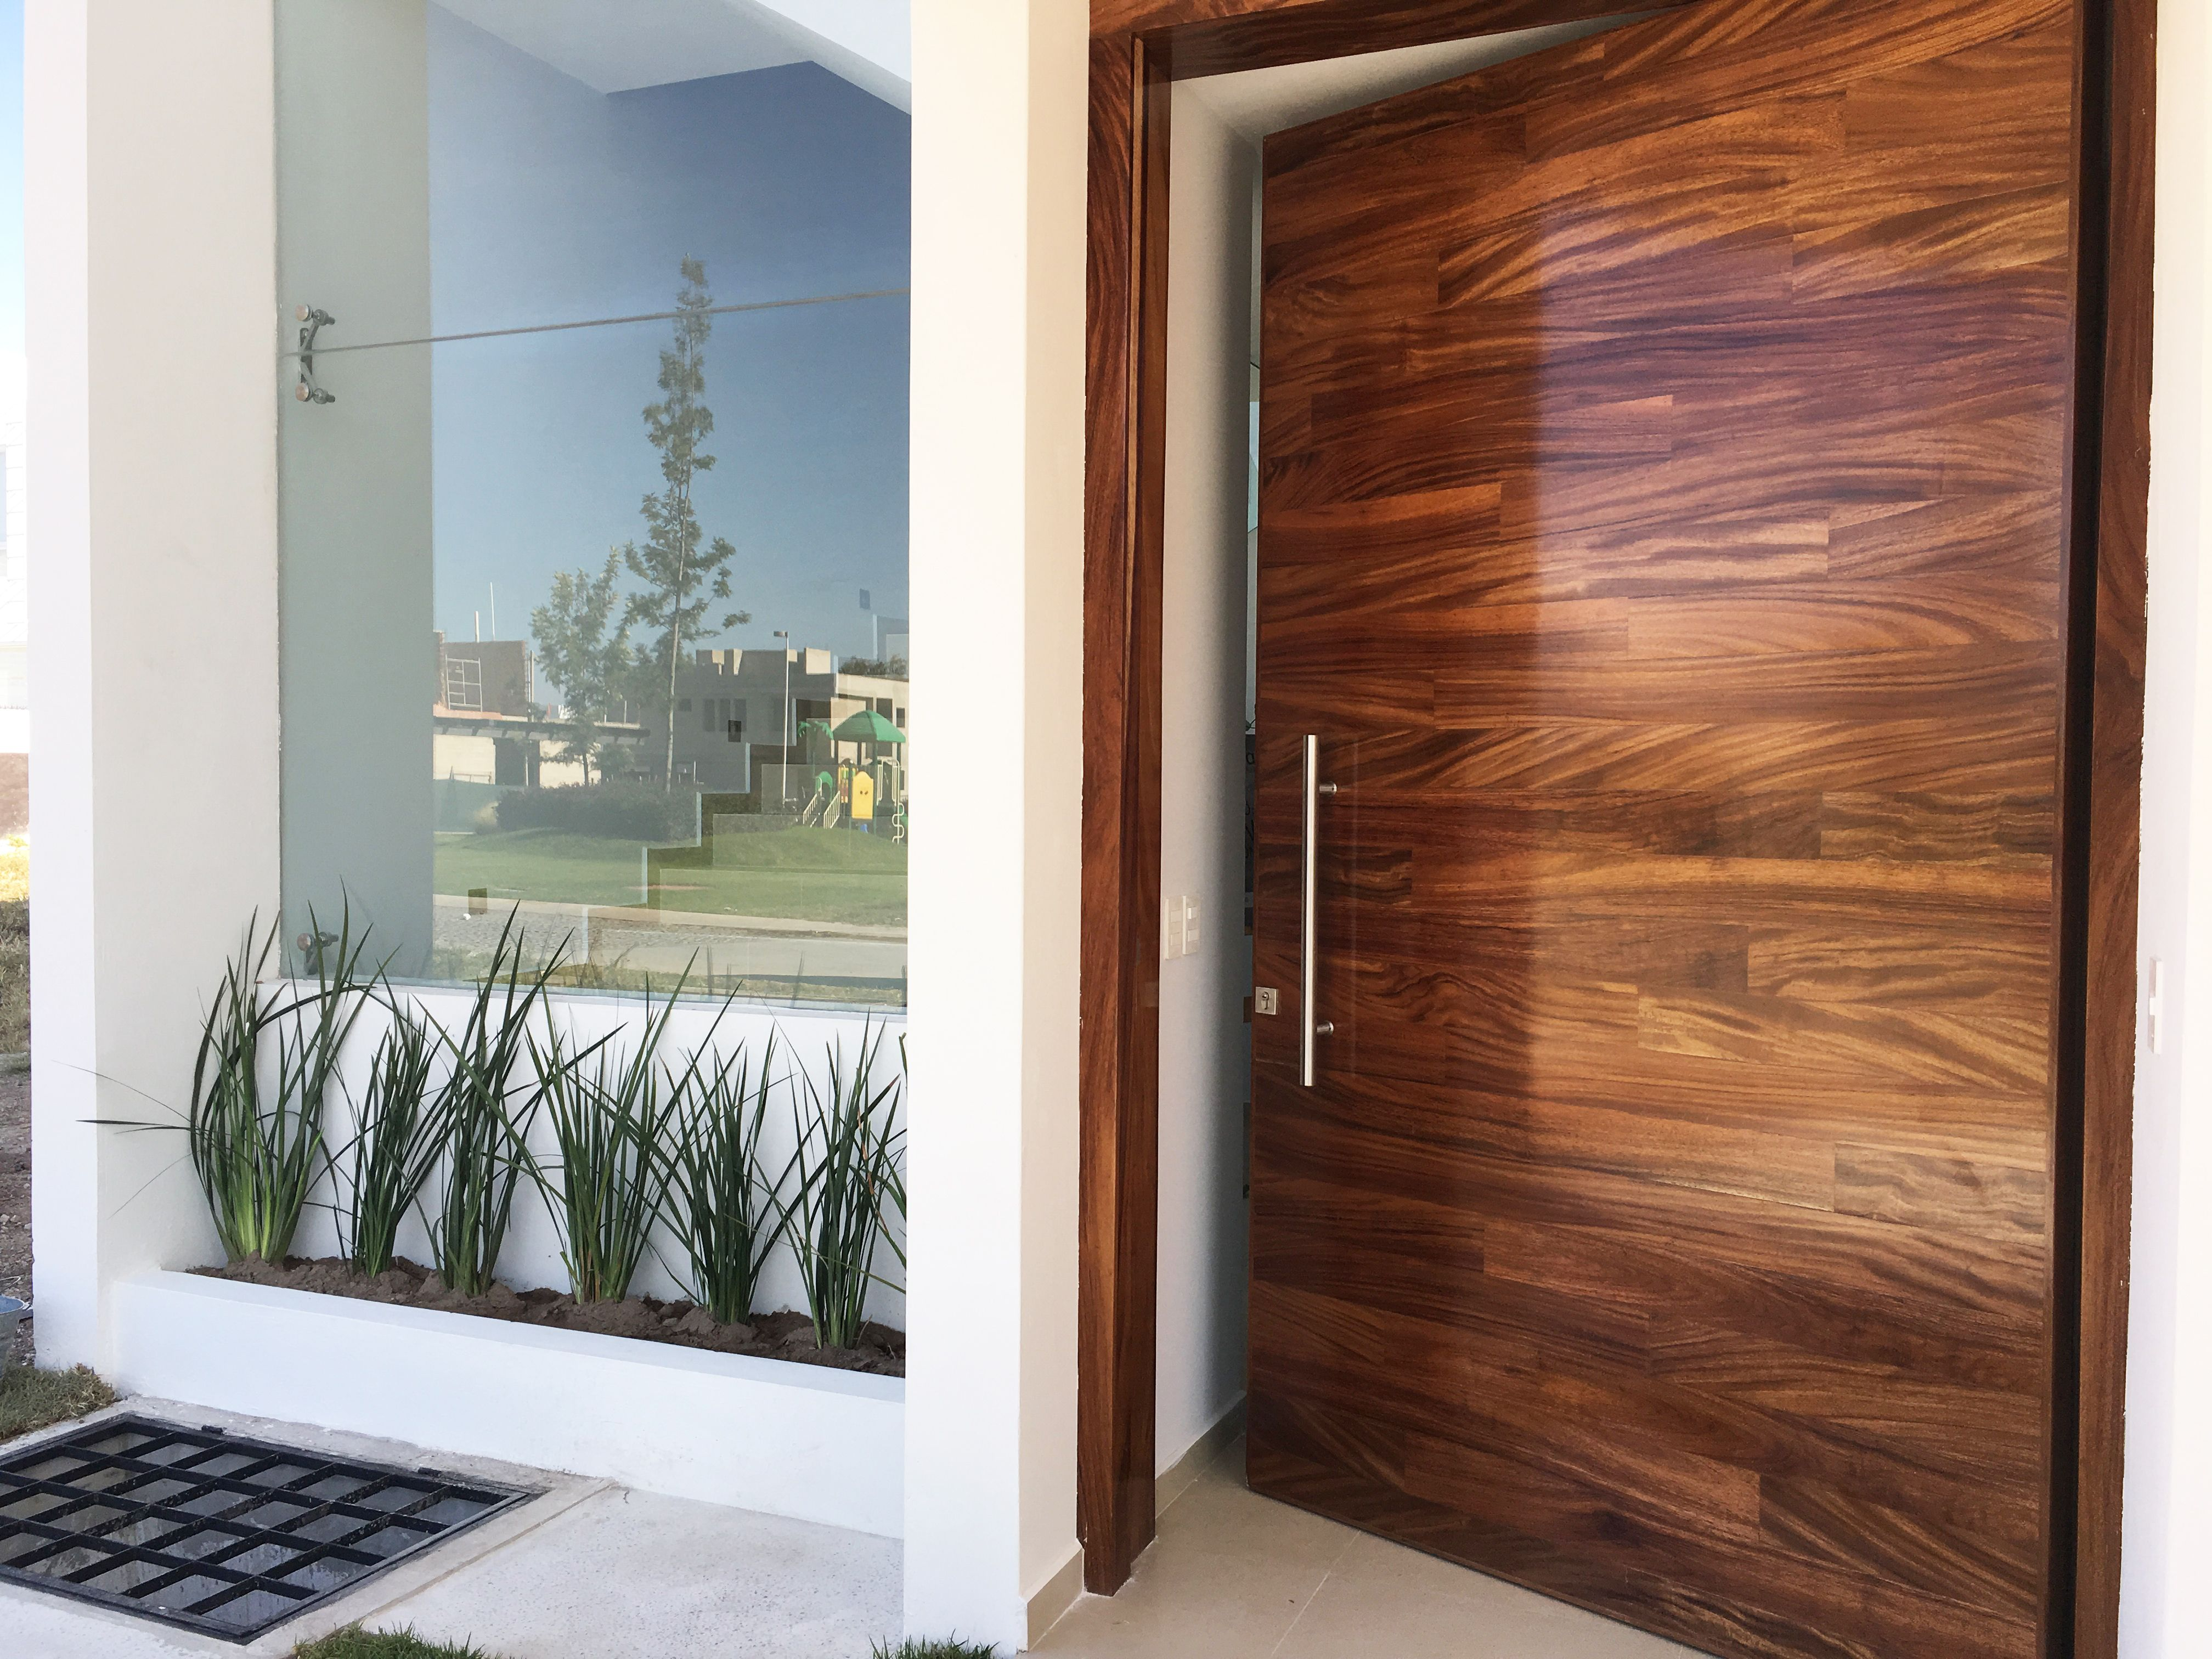 Puerta madera parota punto sur residencial planlife for Puertas de entrada de madera modernas